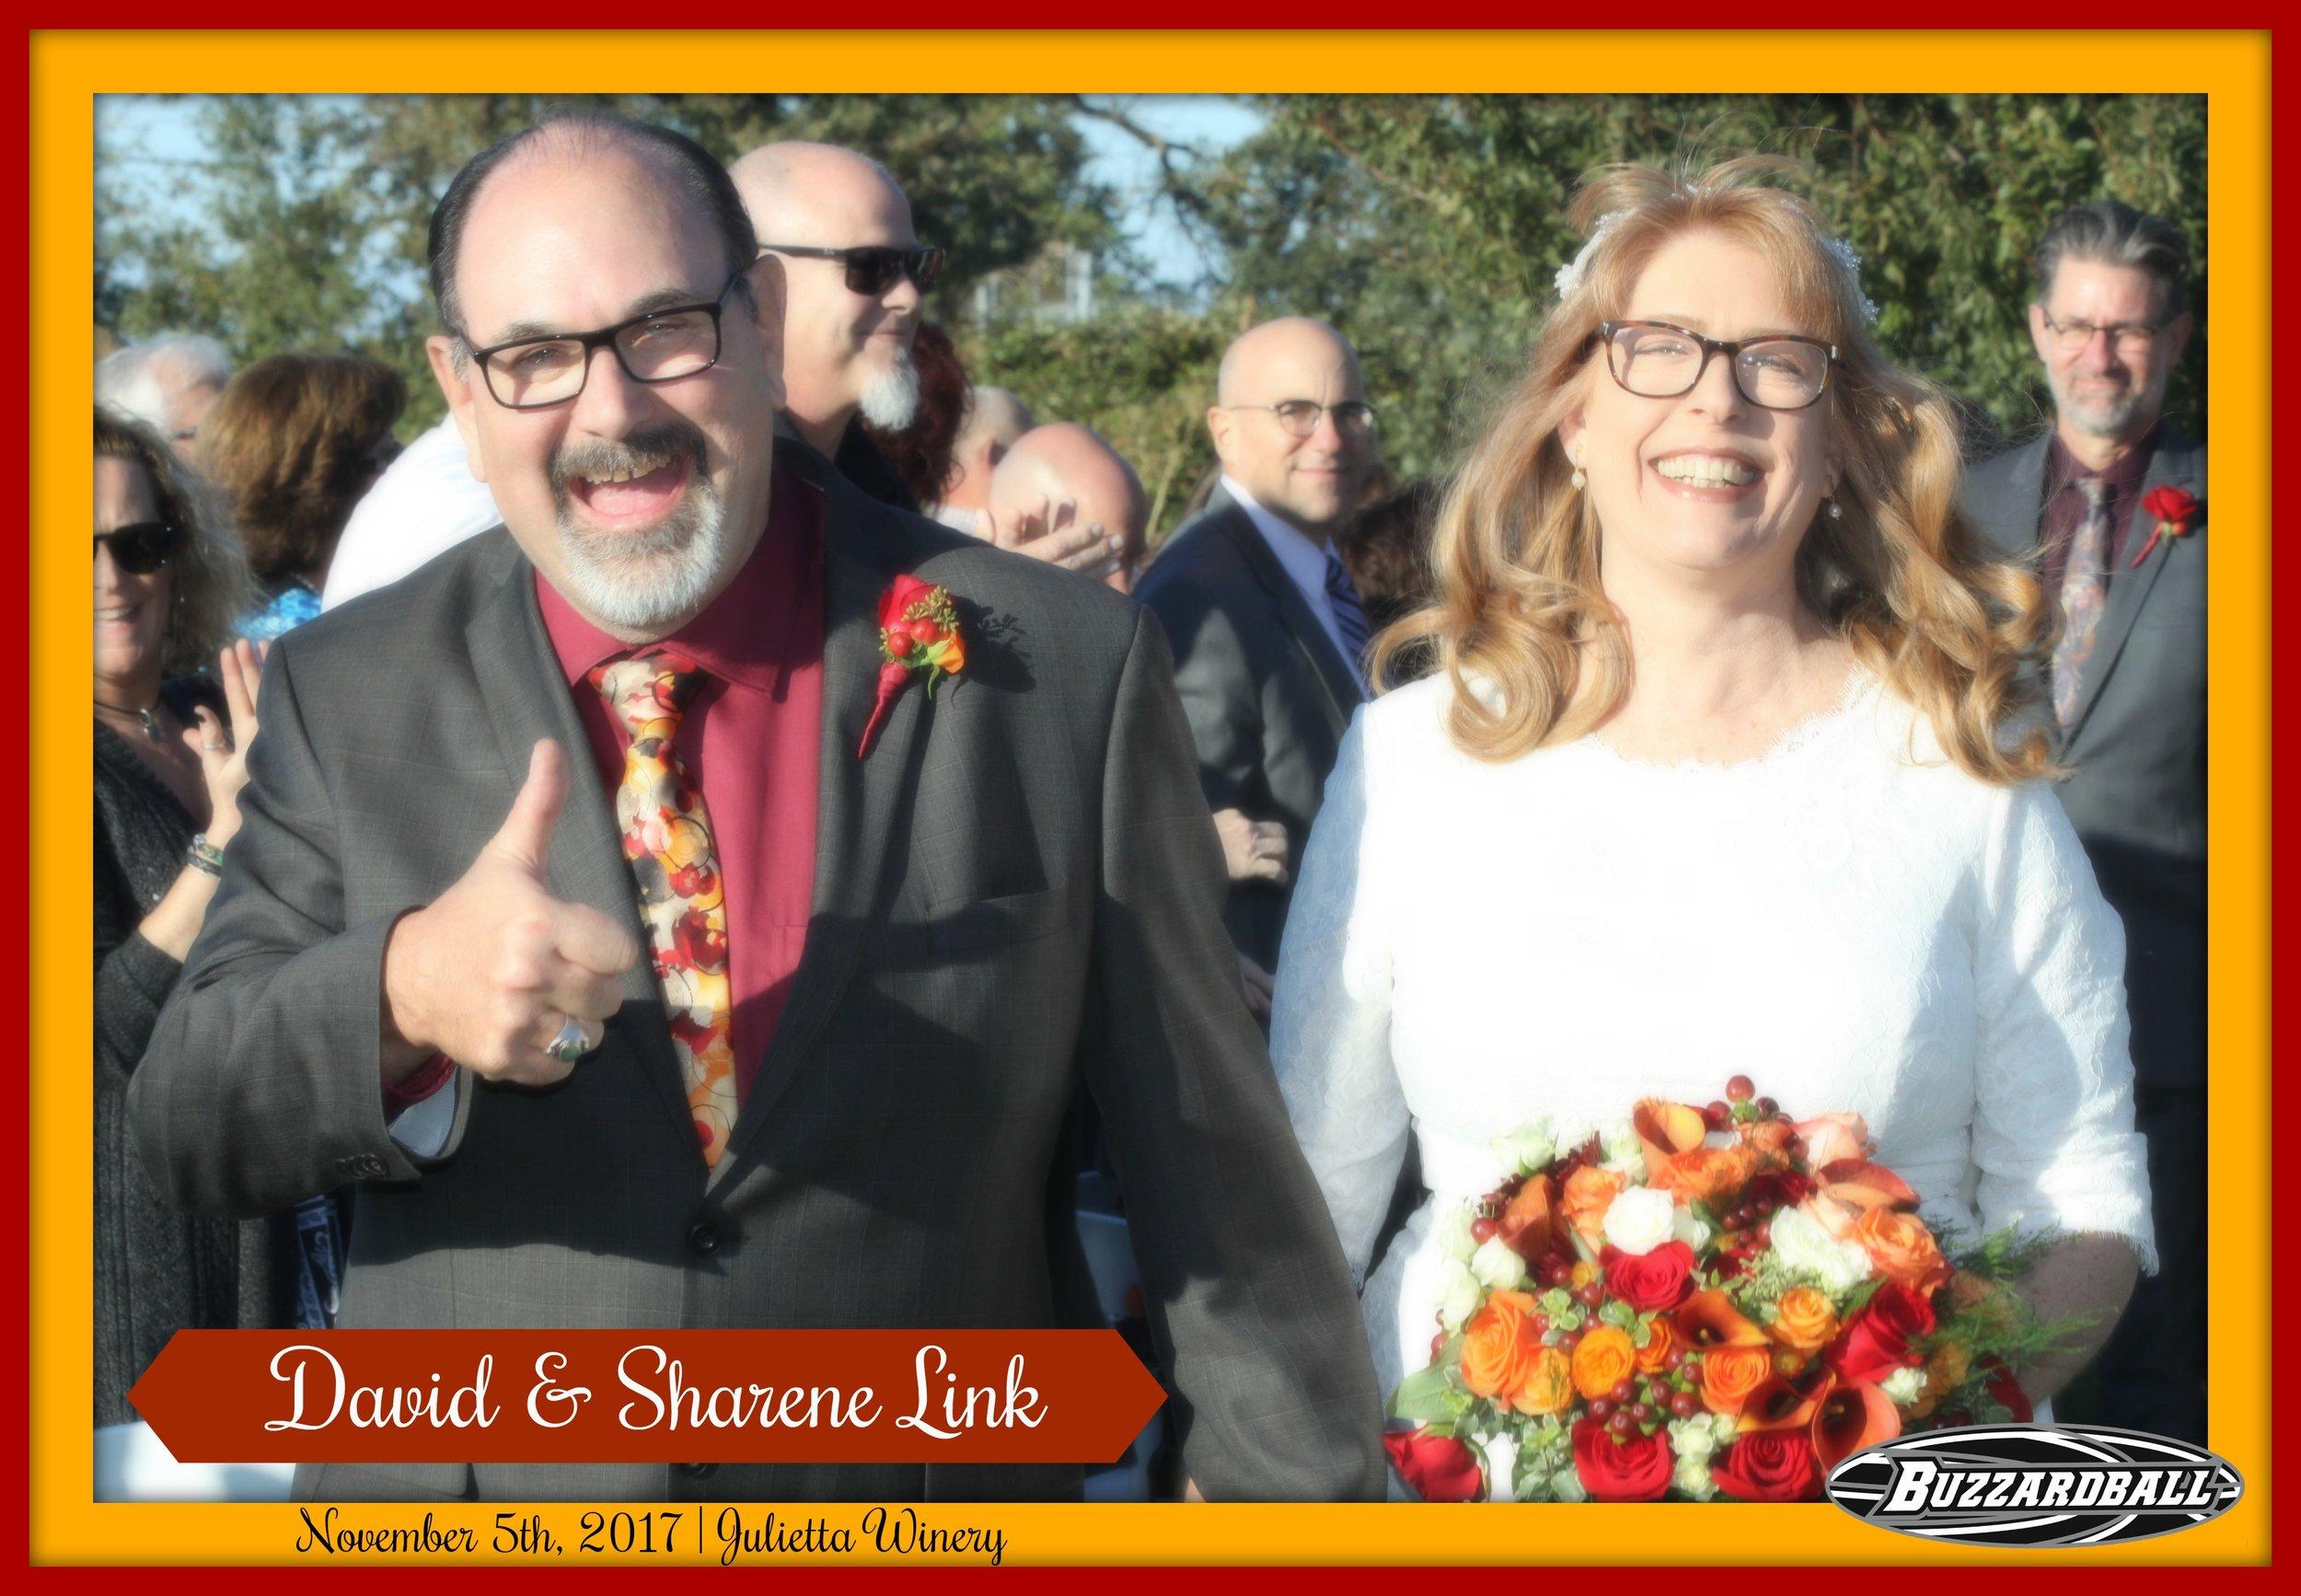 2017 11 5 David and Sharene Link.jpg